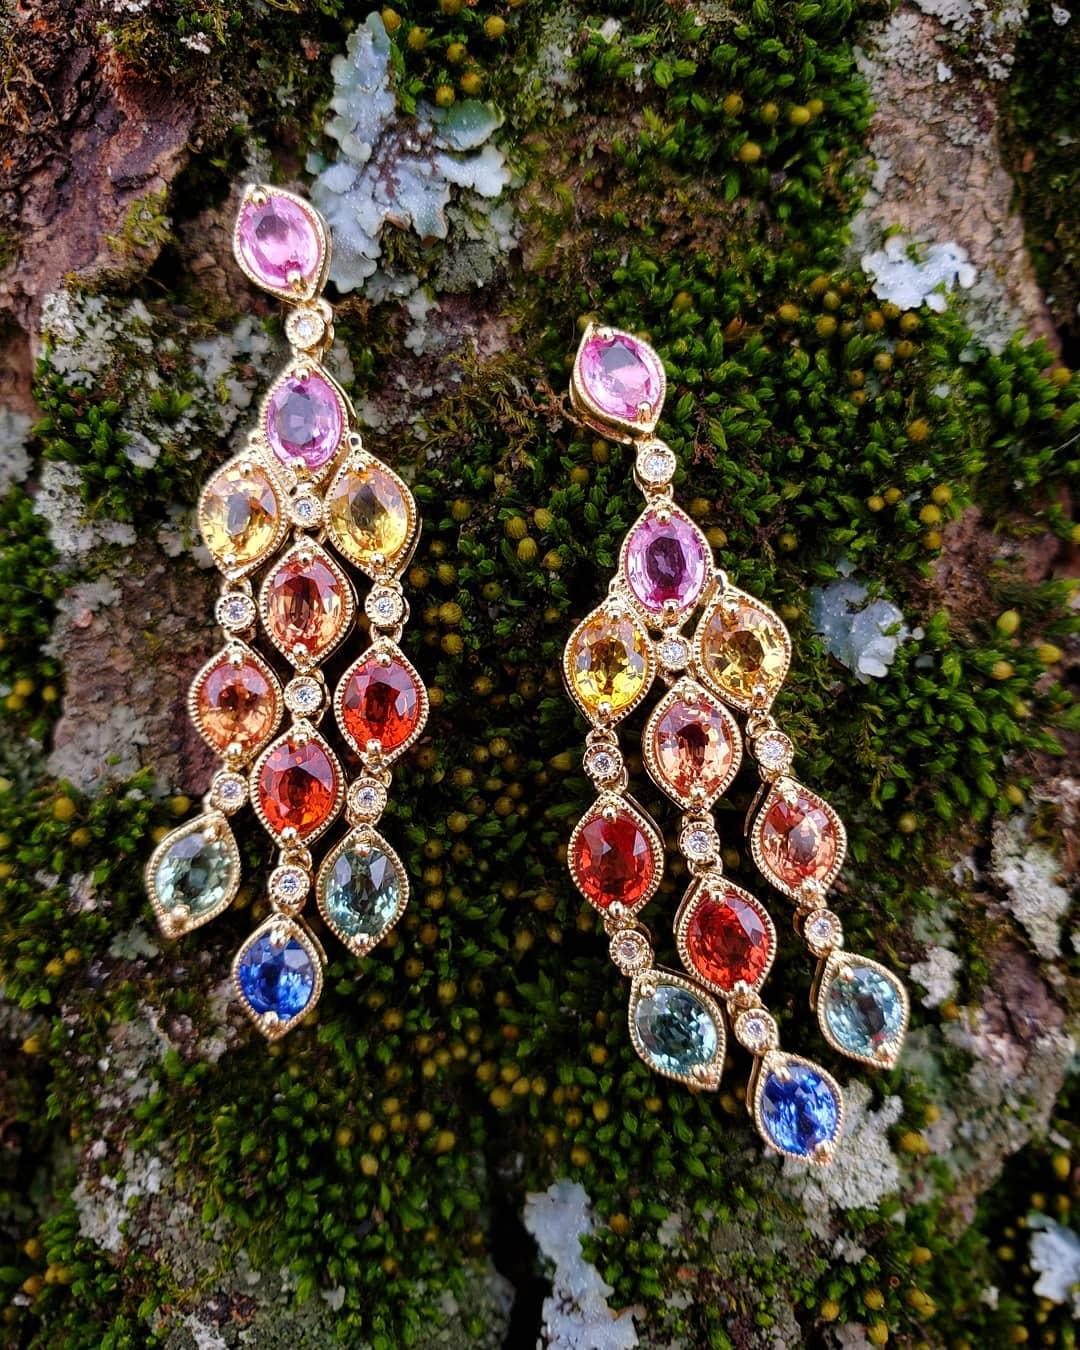 Best Jewelry Online: Multi-Colour Gem Stones Hanging Earrings Jewelry Online